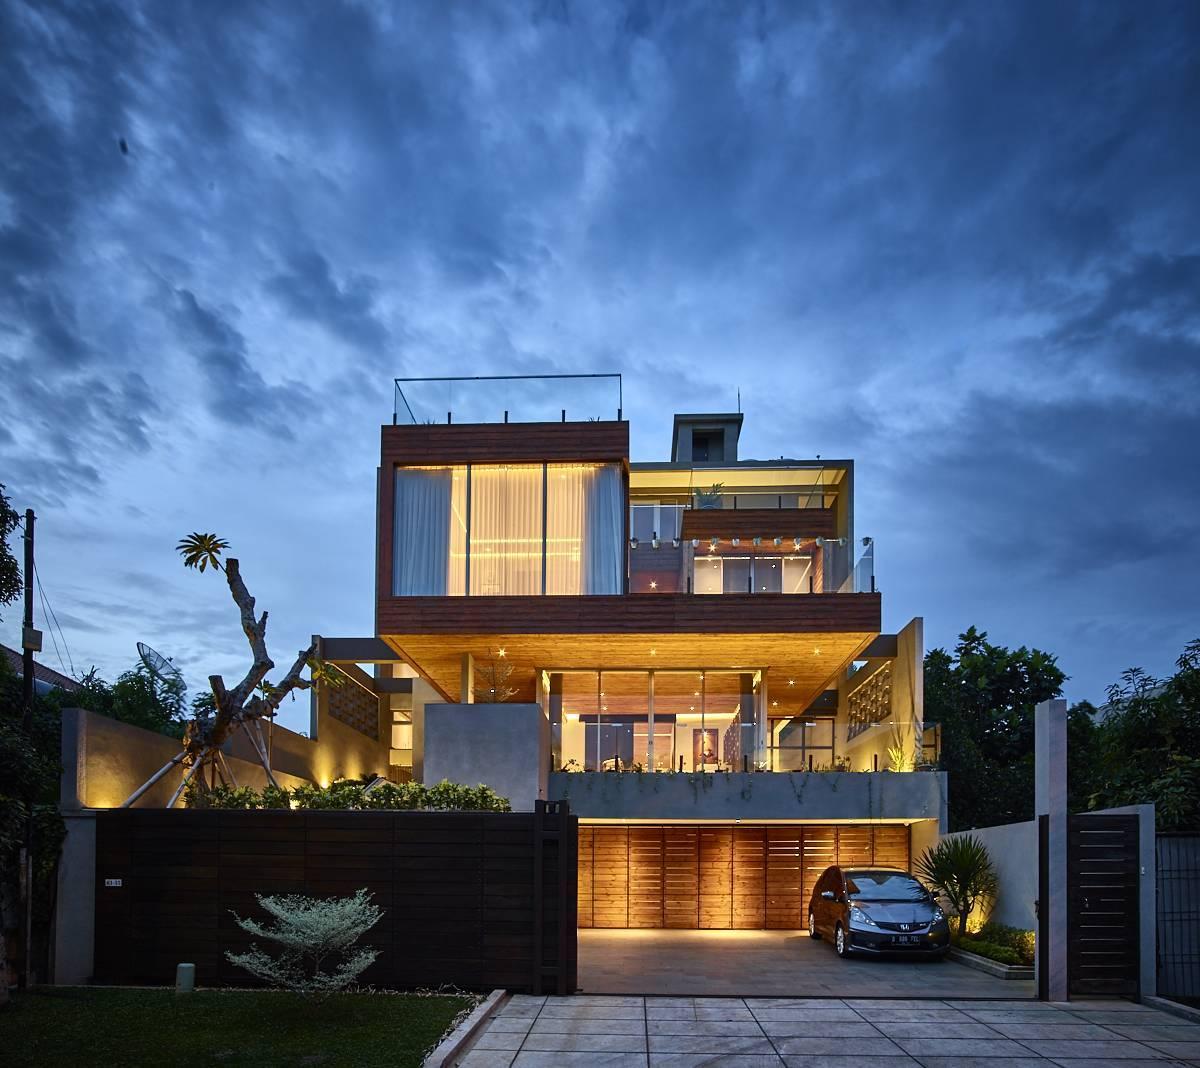 Raw Architecture Kembang Murni House West Jakarta, Indonesia West Jakarta, Indonesia Night Front View   1600